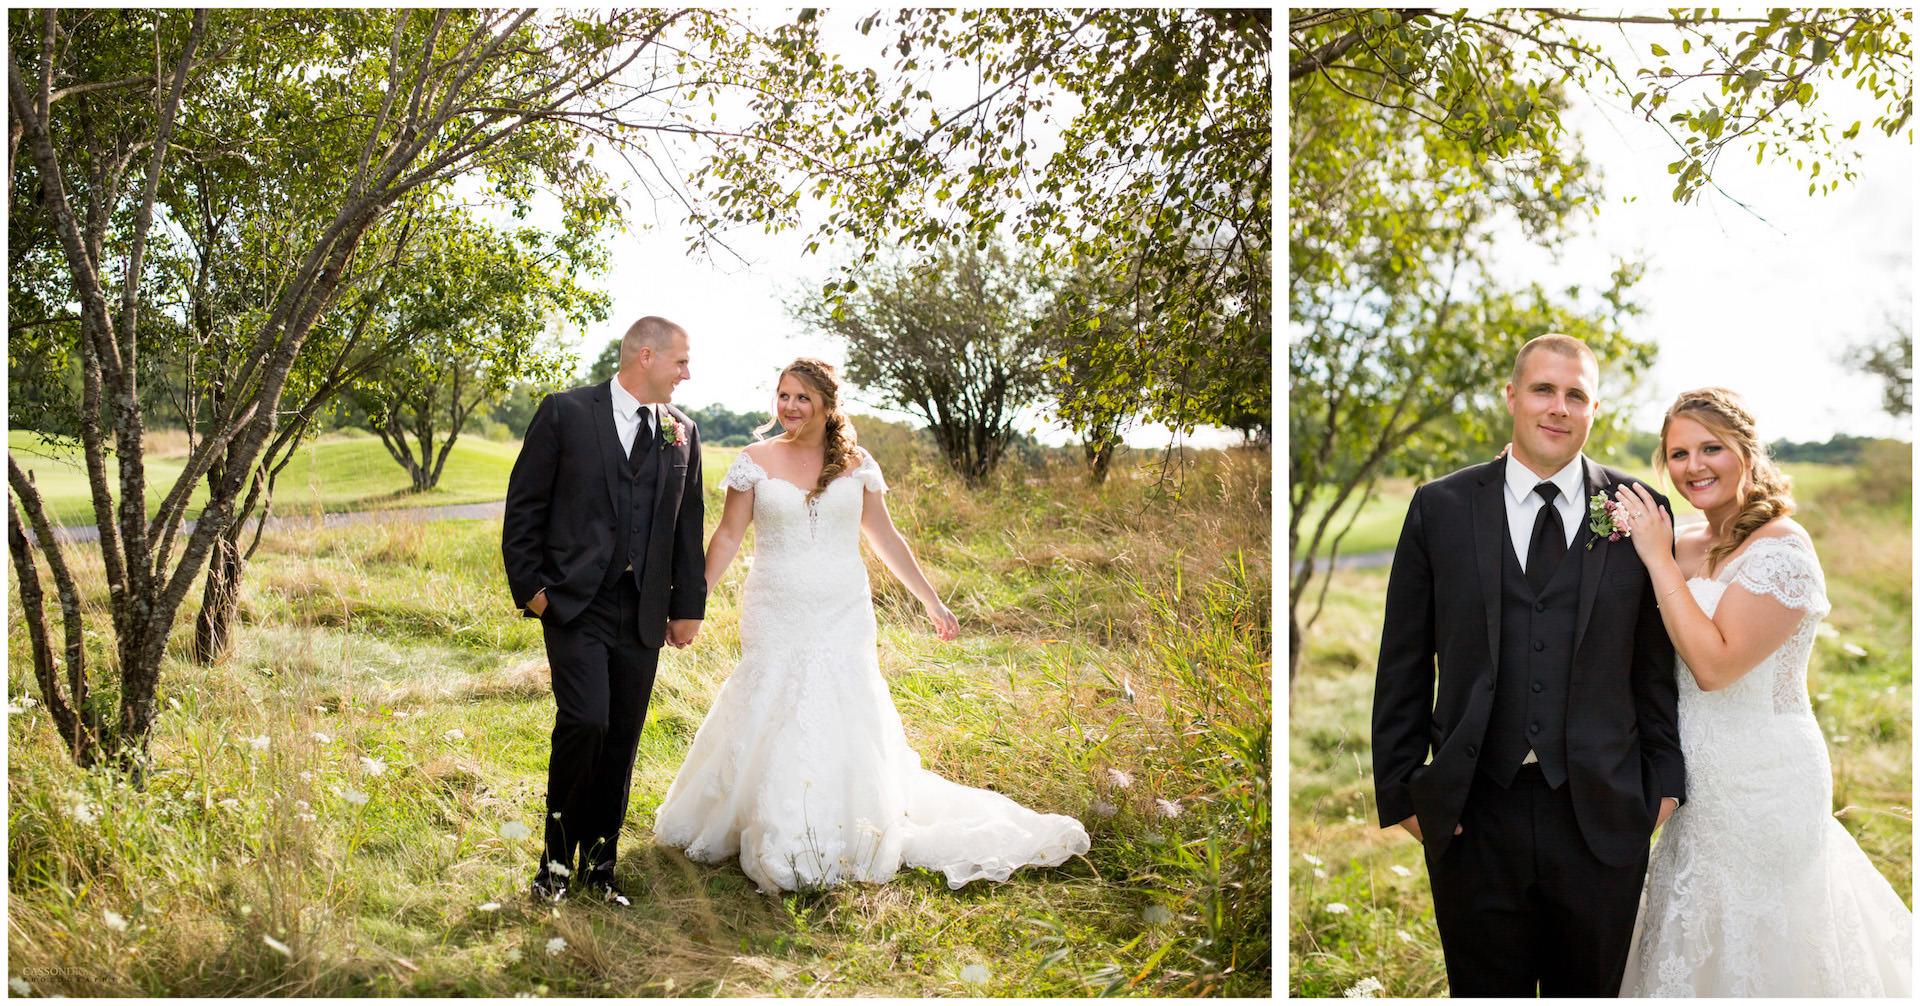 Cassondre Mae Photography Hudson Valley Wedding Photographer 4.jpg